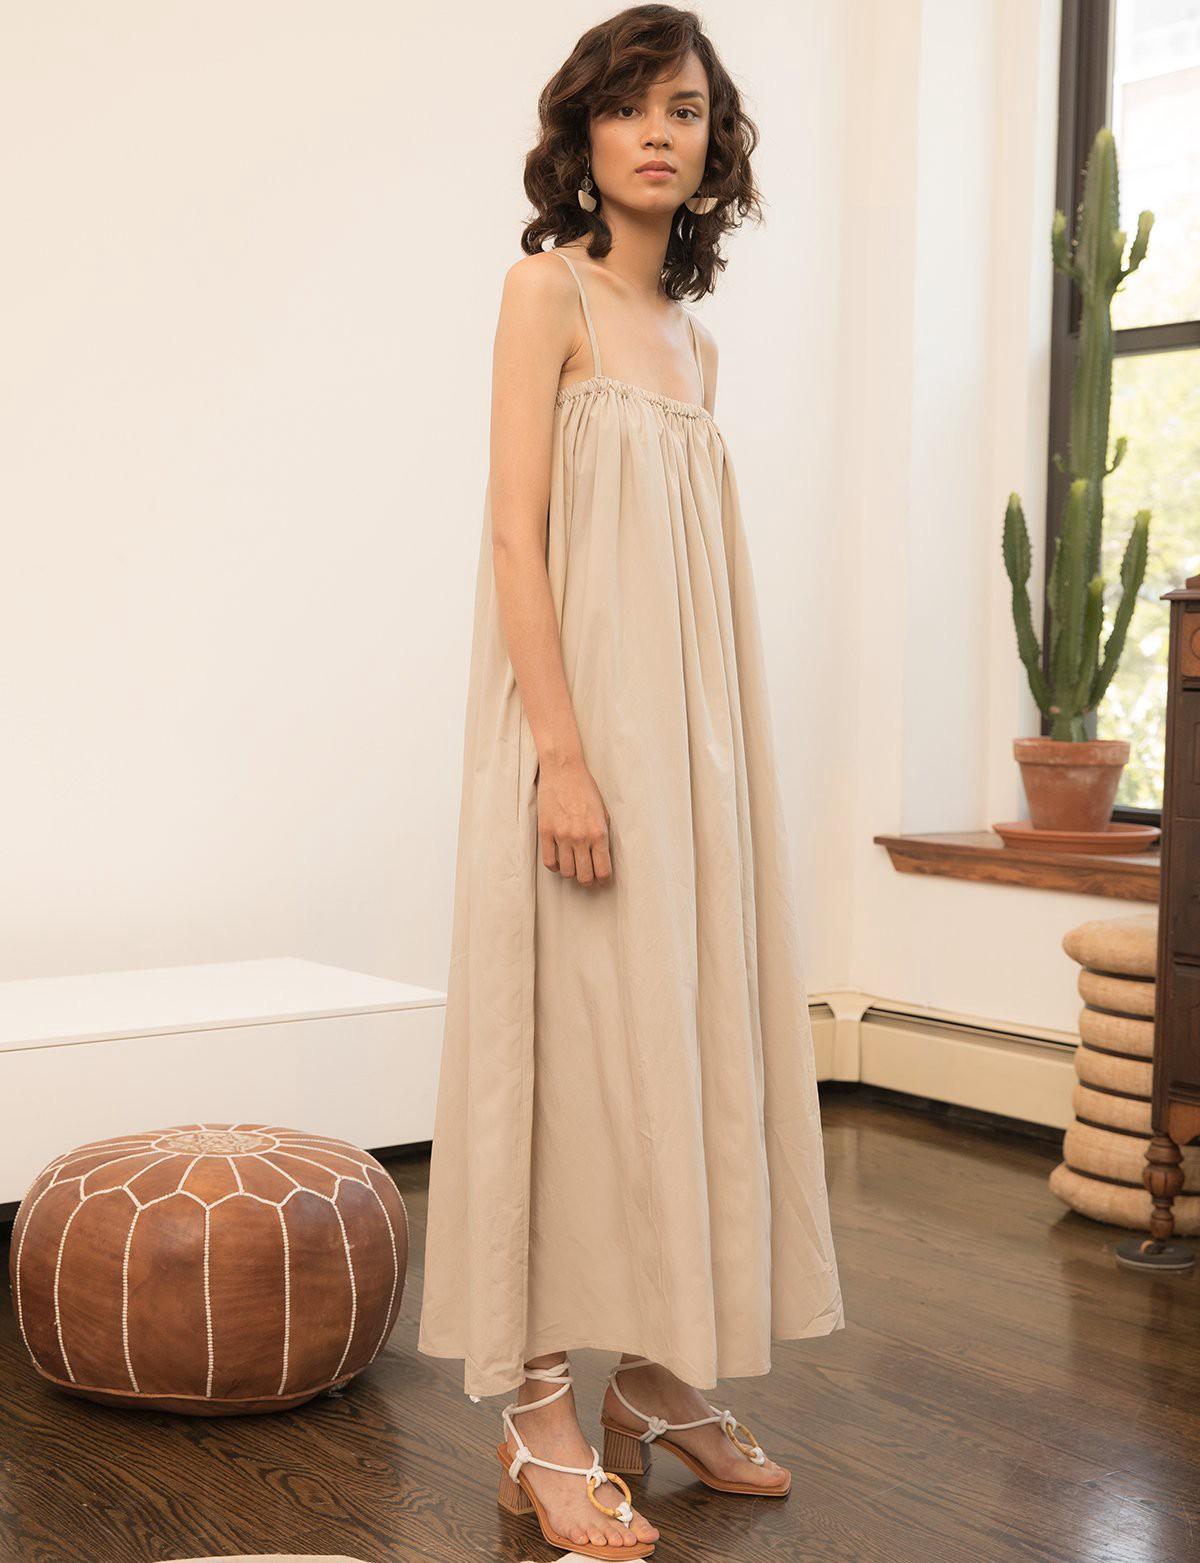 Pixie Market Tan Tank Maxi Dress One Size In 2020 Maxi Tank Dress Dresses Maxi Dress [ 1563 x 1200 Pixel ]